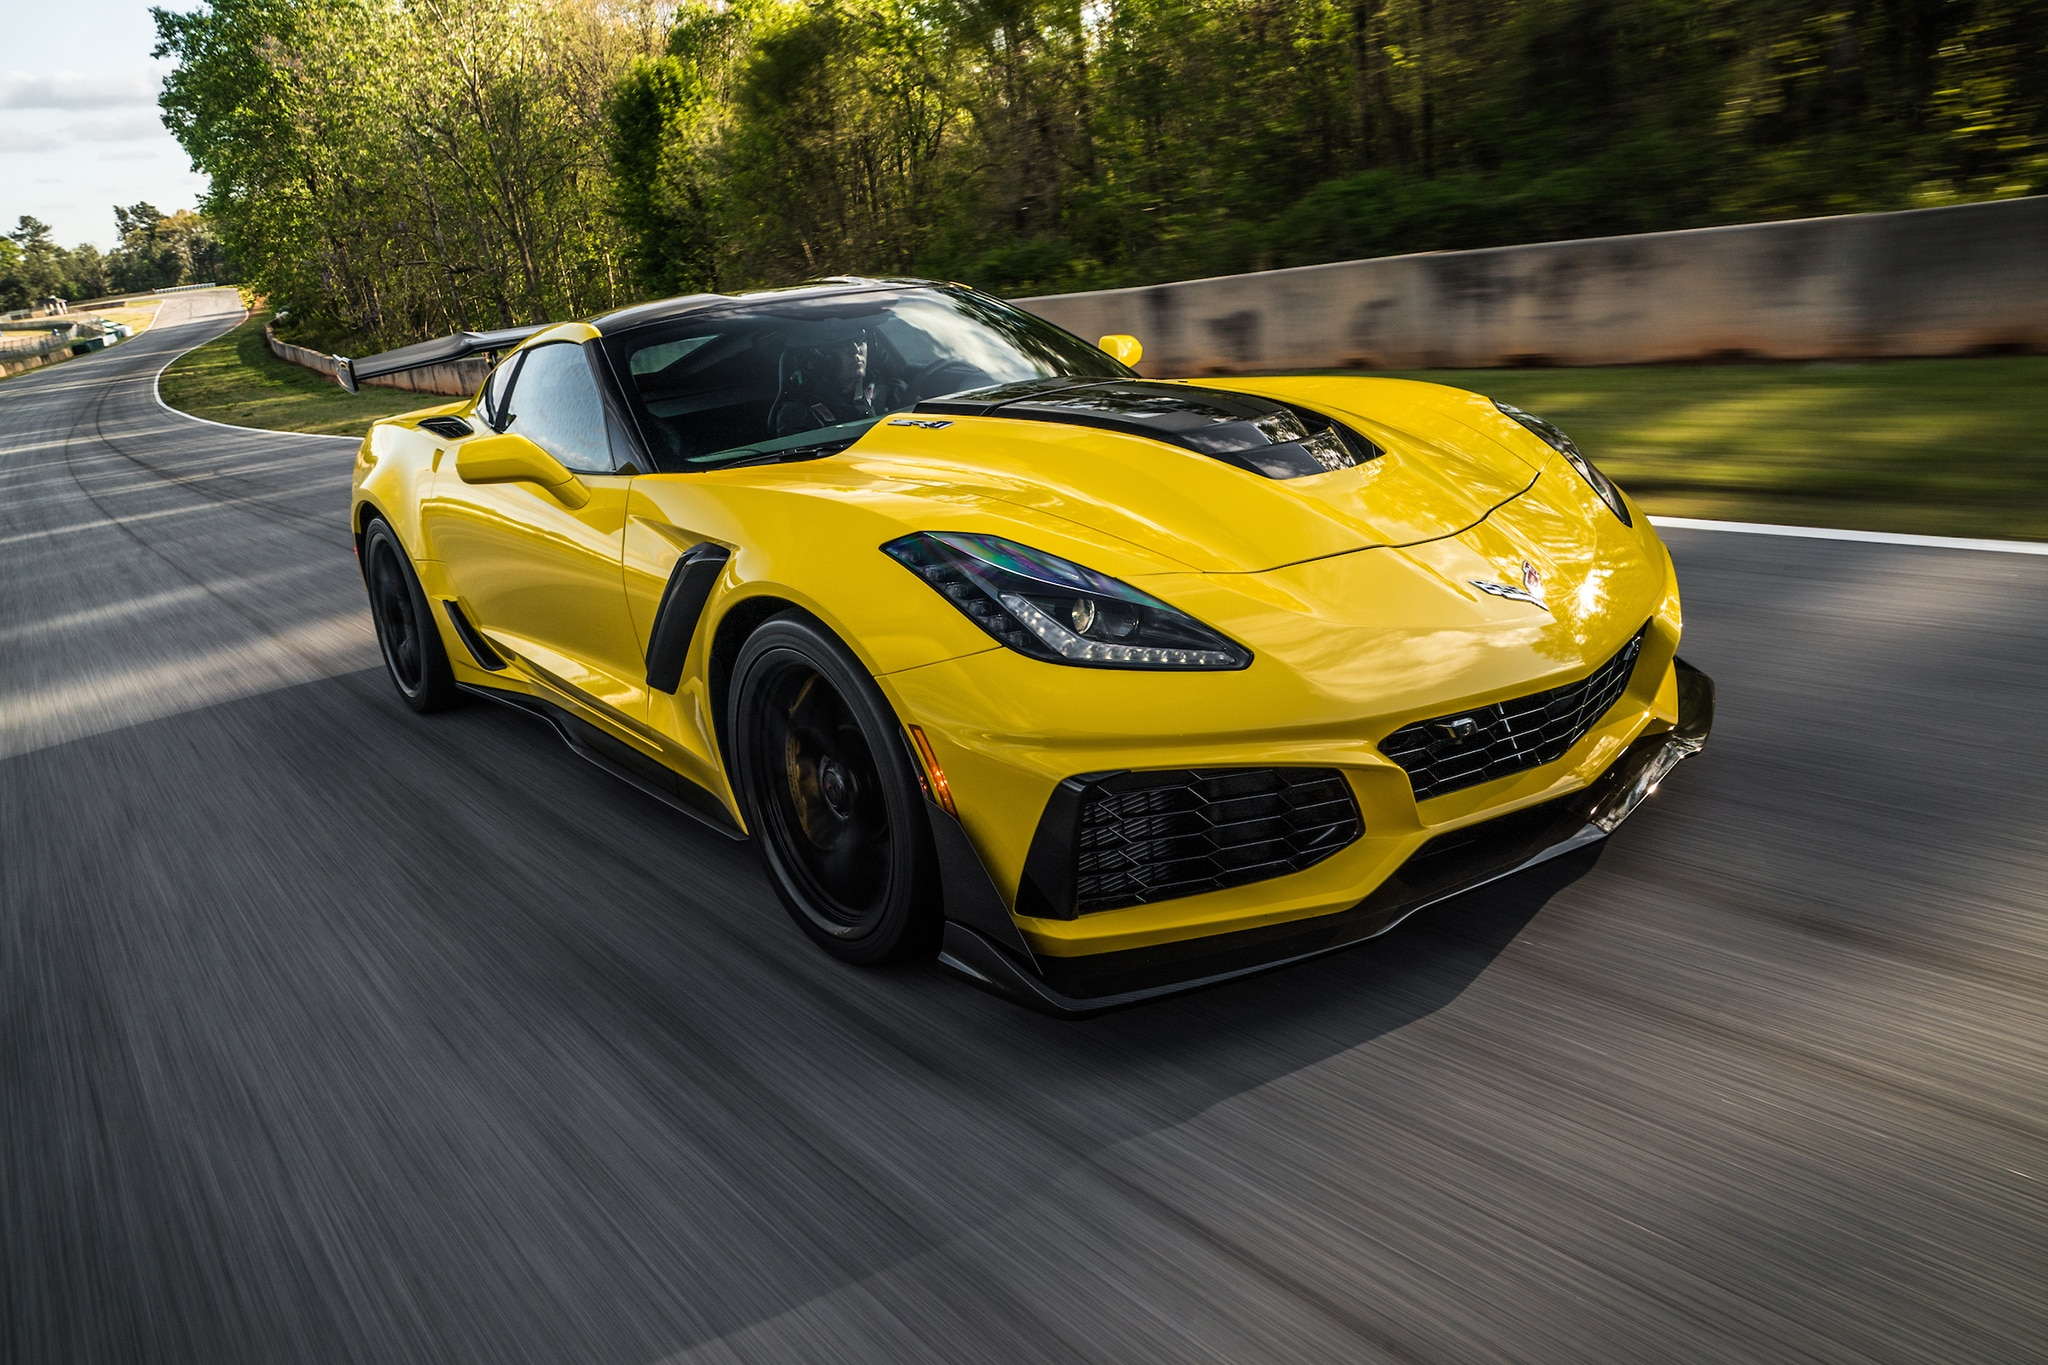 2019 Chevrolet Corvette ZR1 First Drive | Automobile Magazine